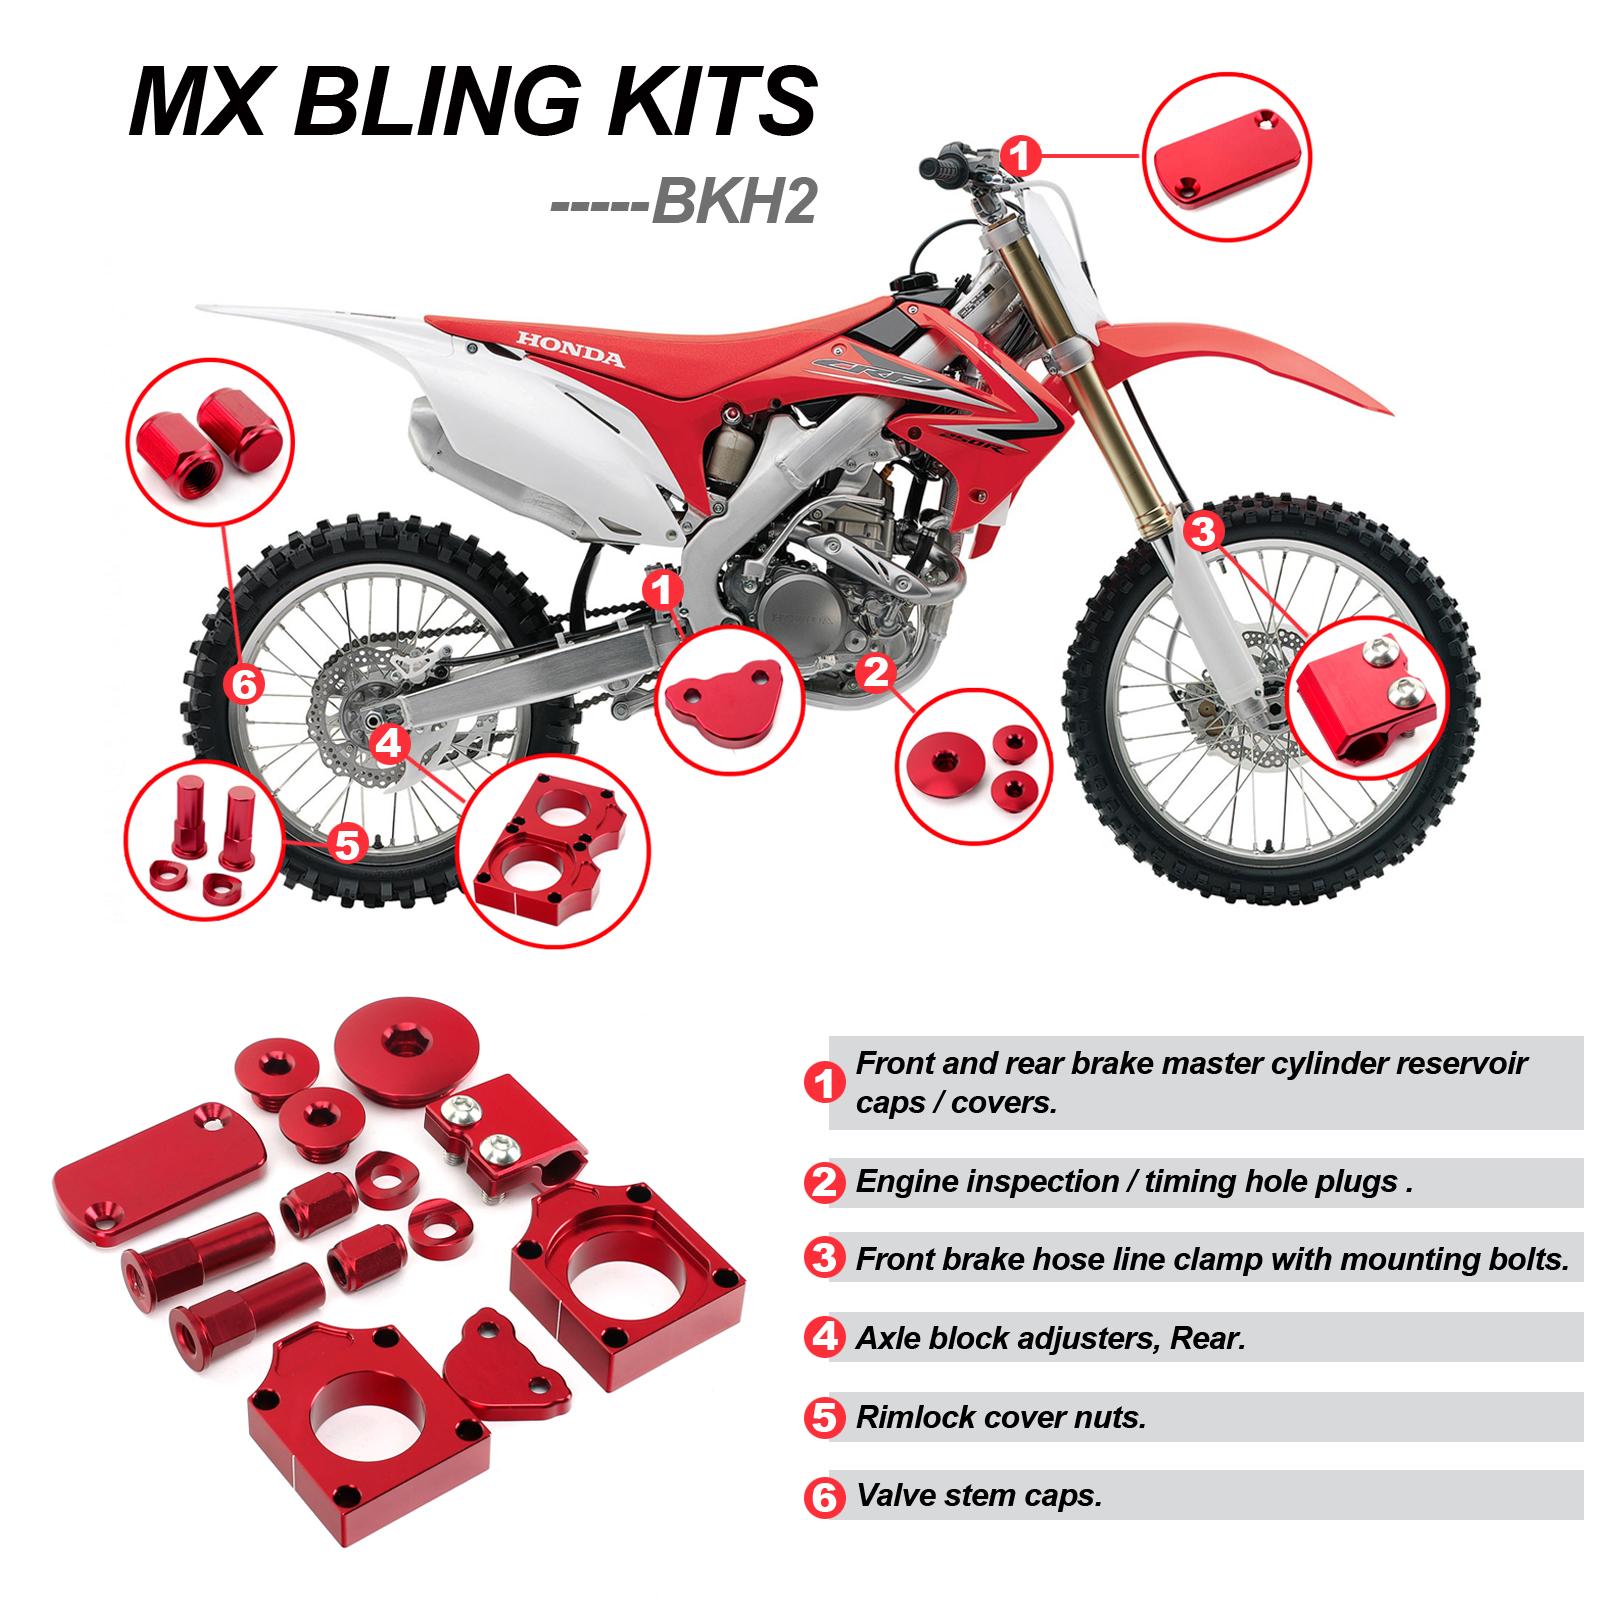 CNC Billet Aluminum Bling Kits for Honda CRF450R 2009-2018 CRF450RX 2017 18 Red